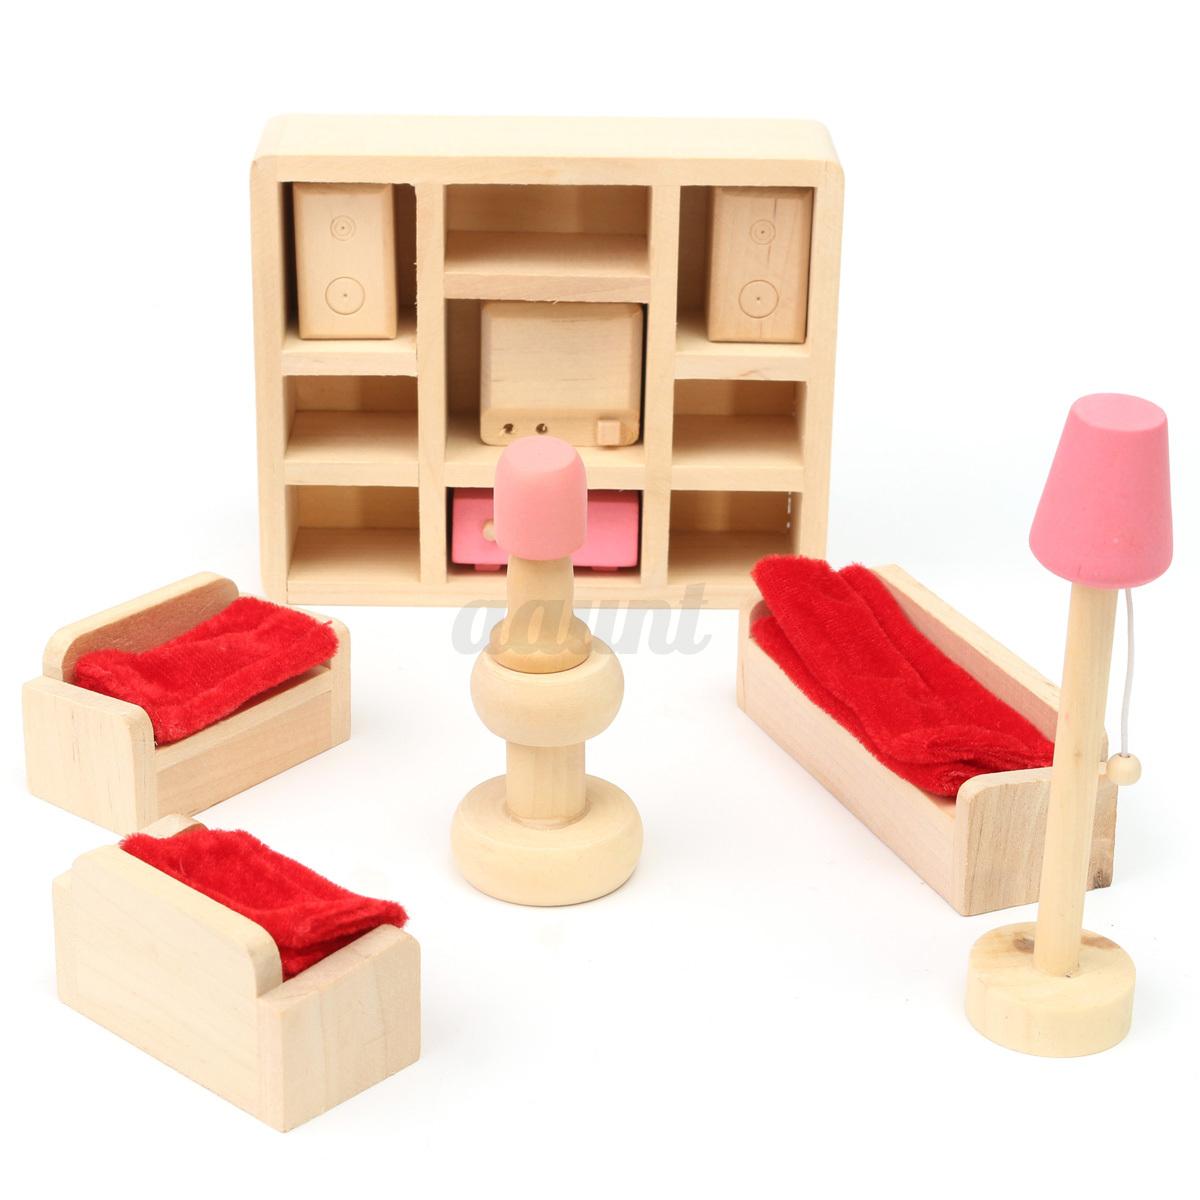 Miniature House Family Children Wooden Furniture Doll Set